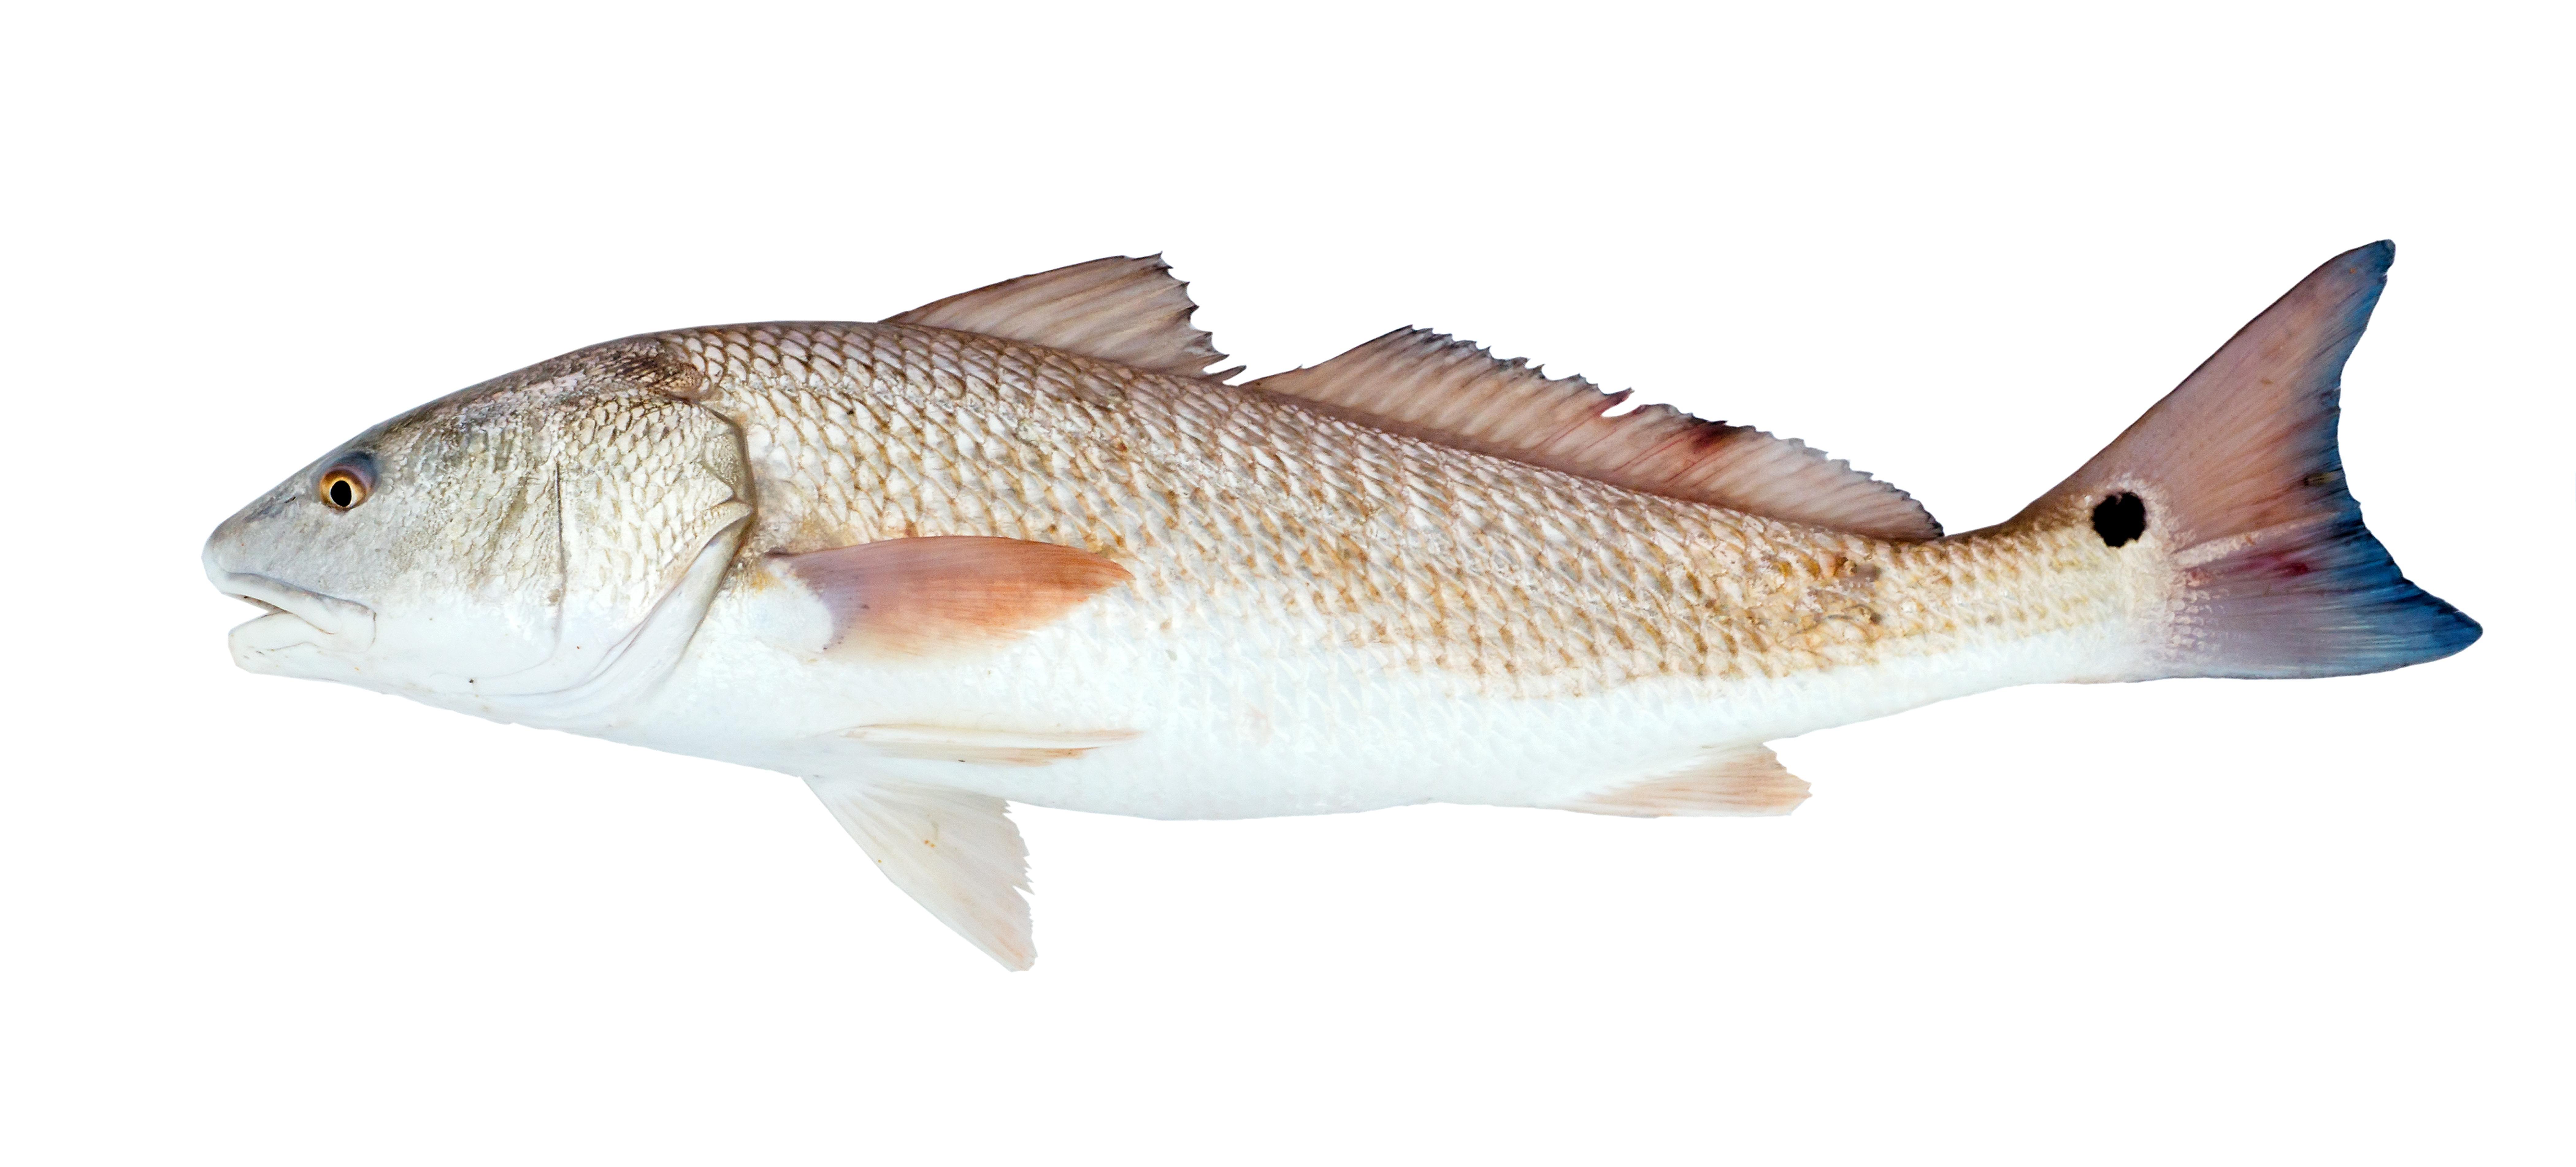 Red Drum Skin-On & Skinless Fillets | Stavis Seafoods